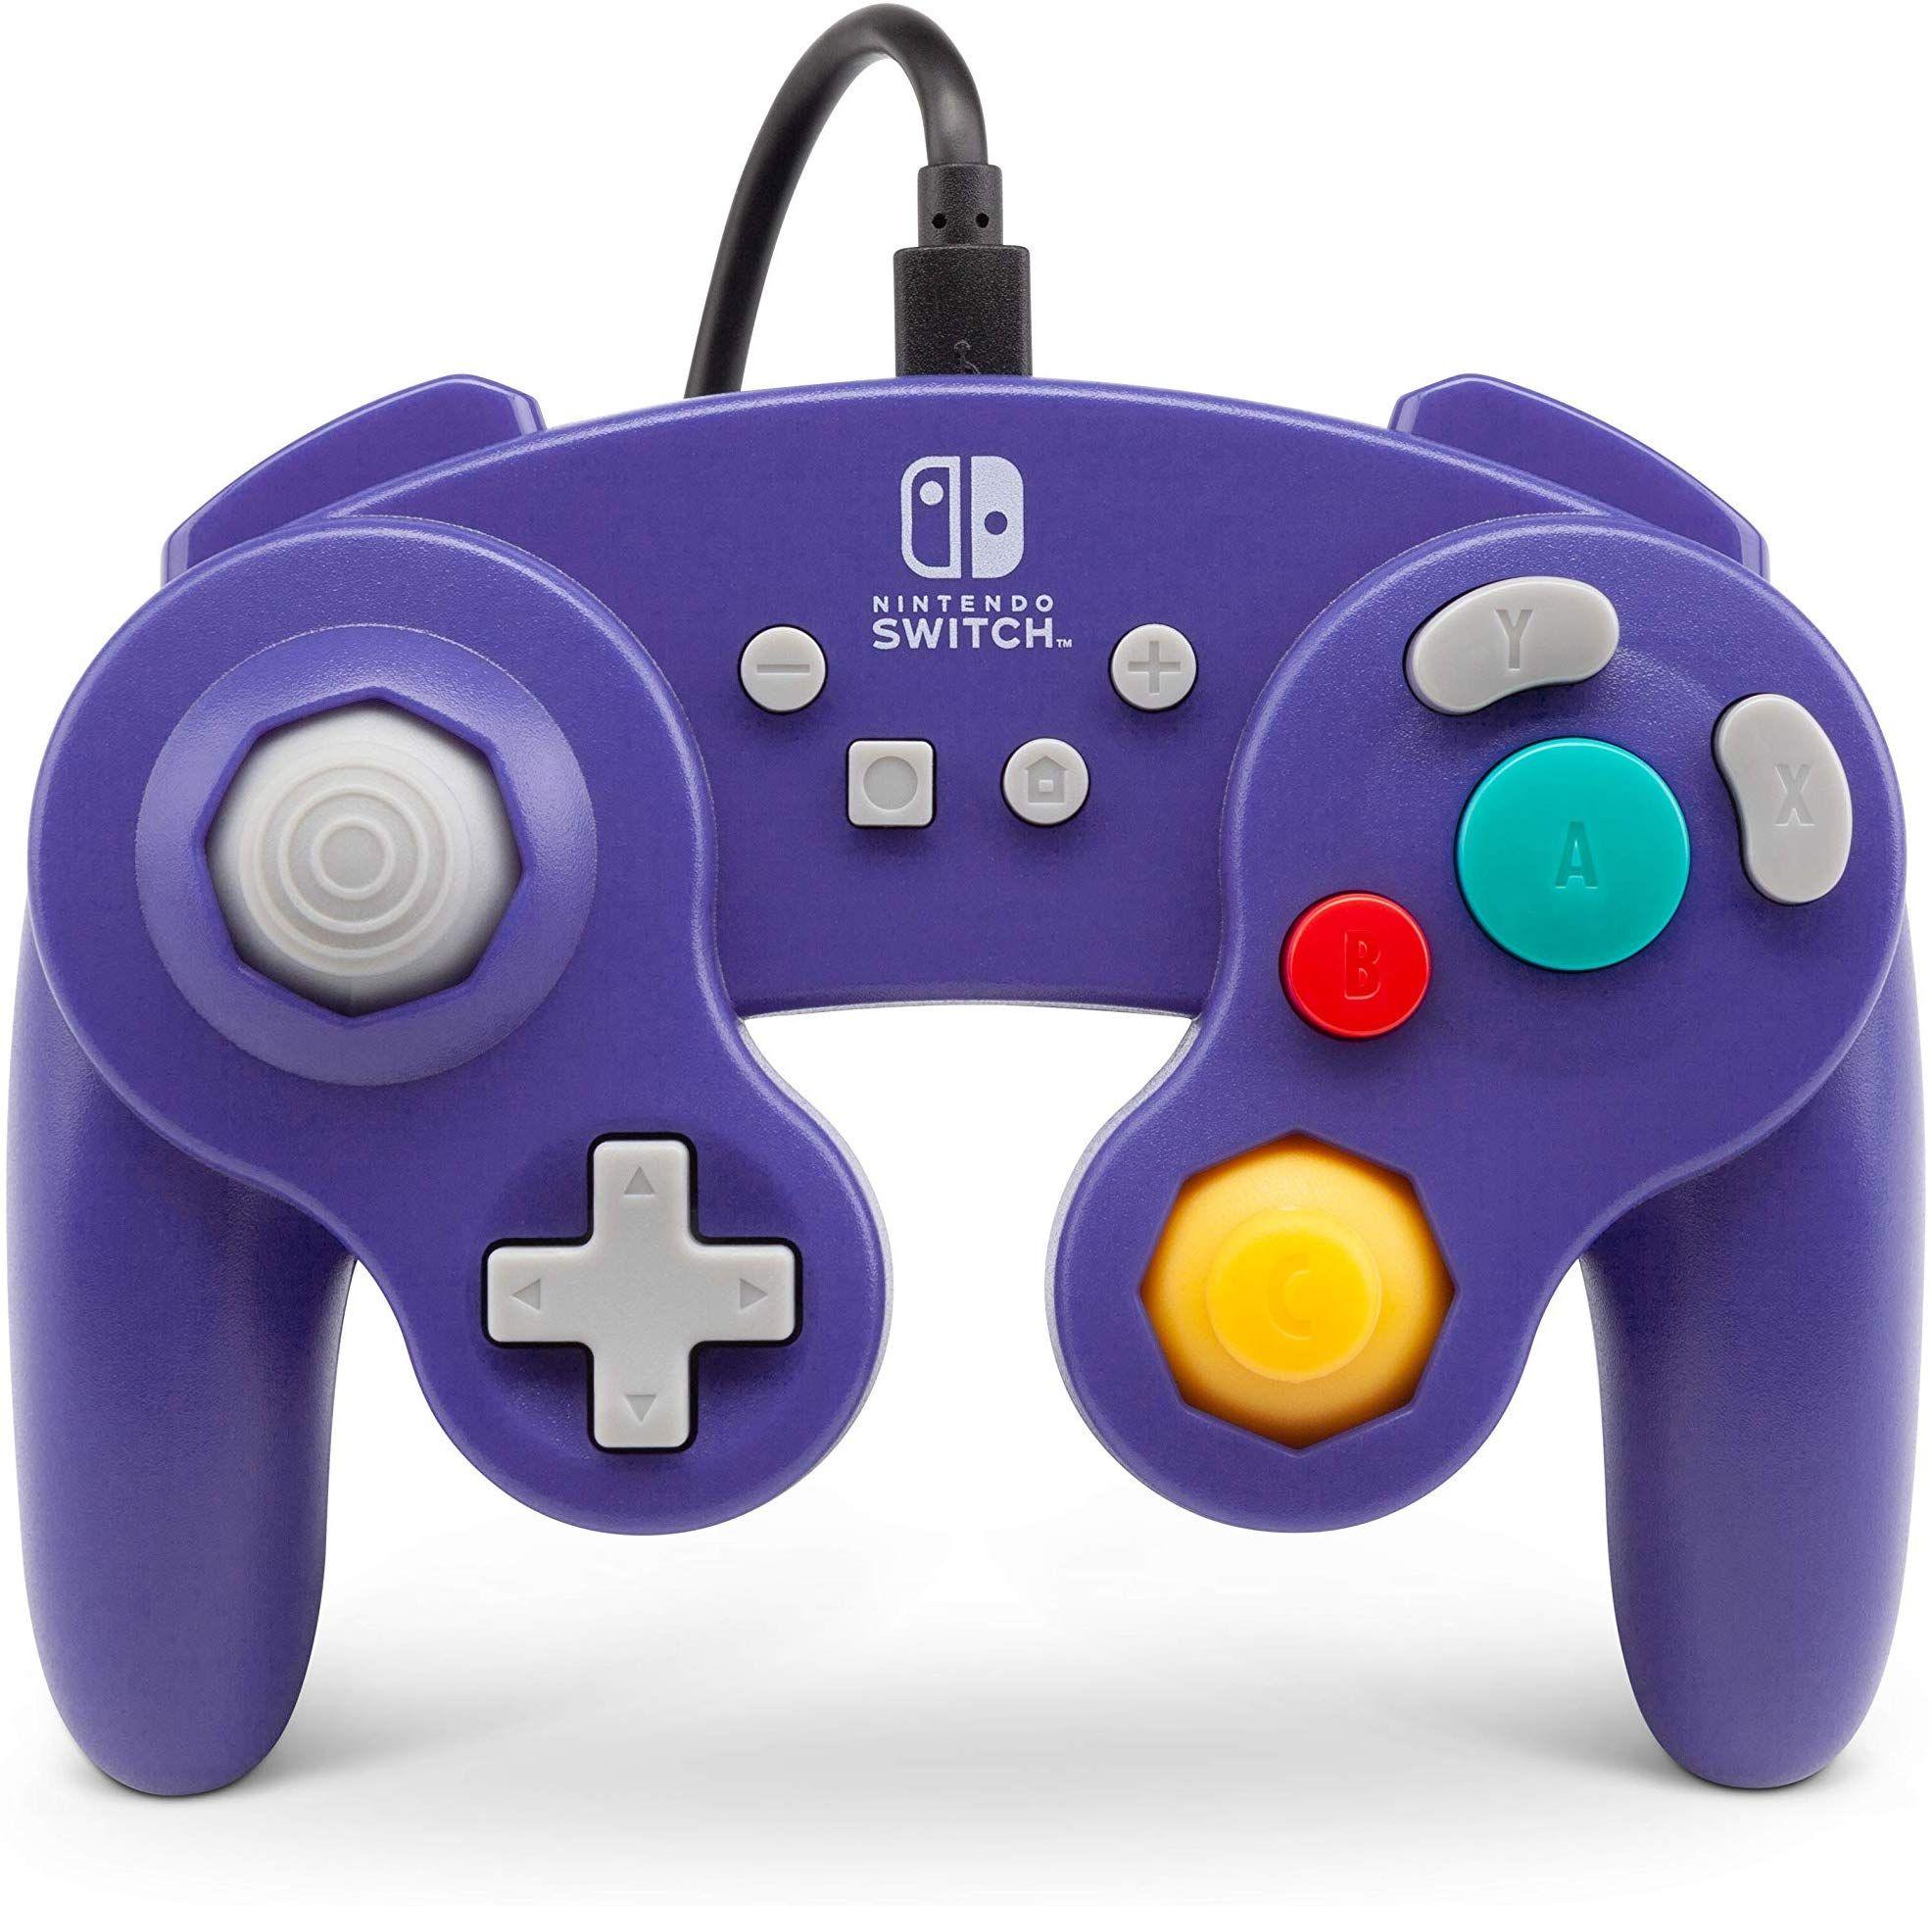 Amazon Com Powera Wired Controller For Nintendo Switch Gamecube Style Purple Nintendo Switch Video Game Gamecube Controller Buy Nintendo Switch Gamecube